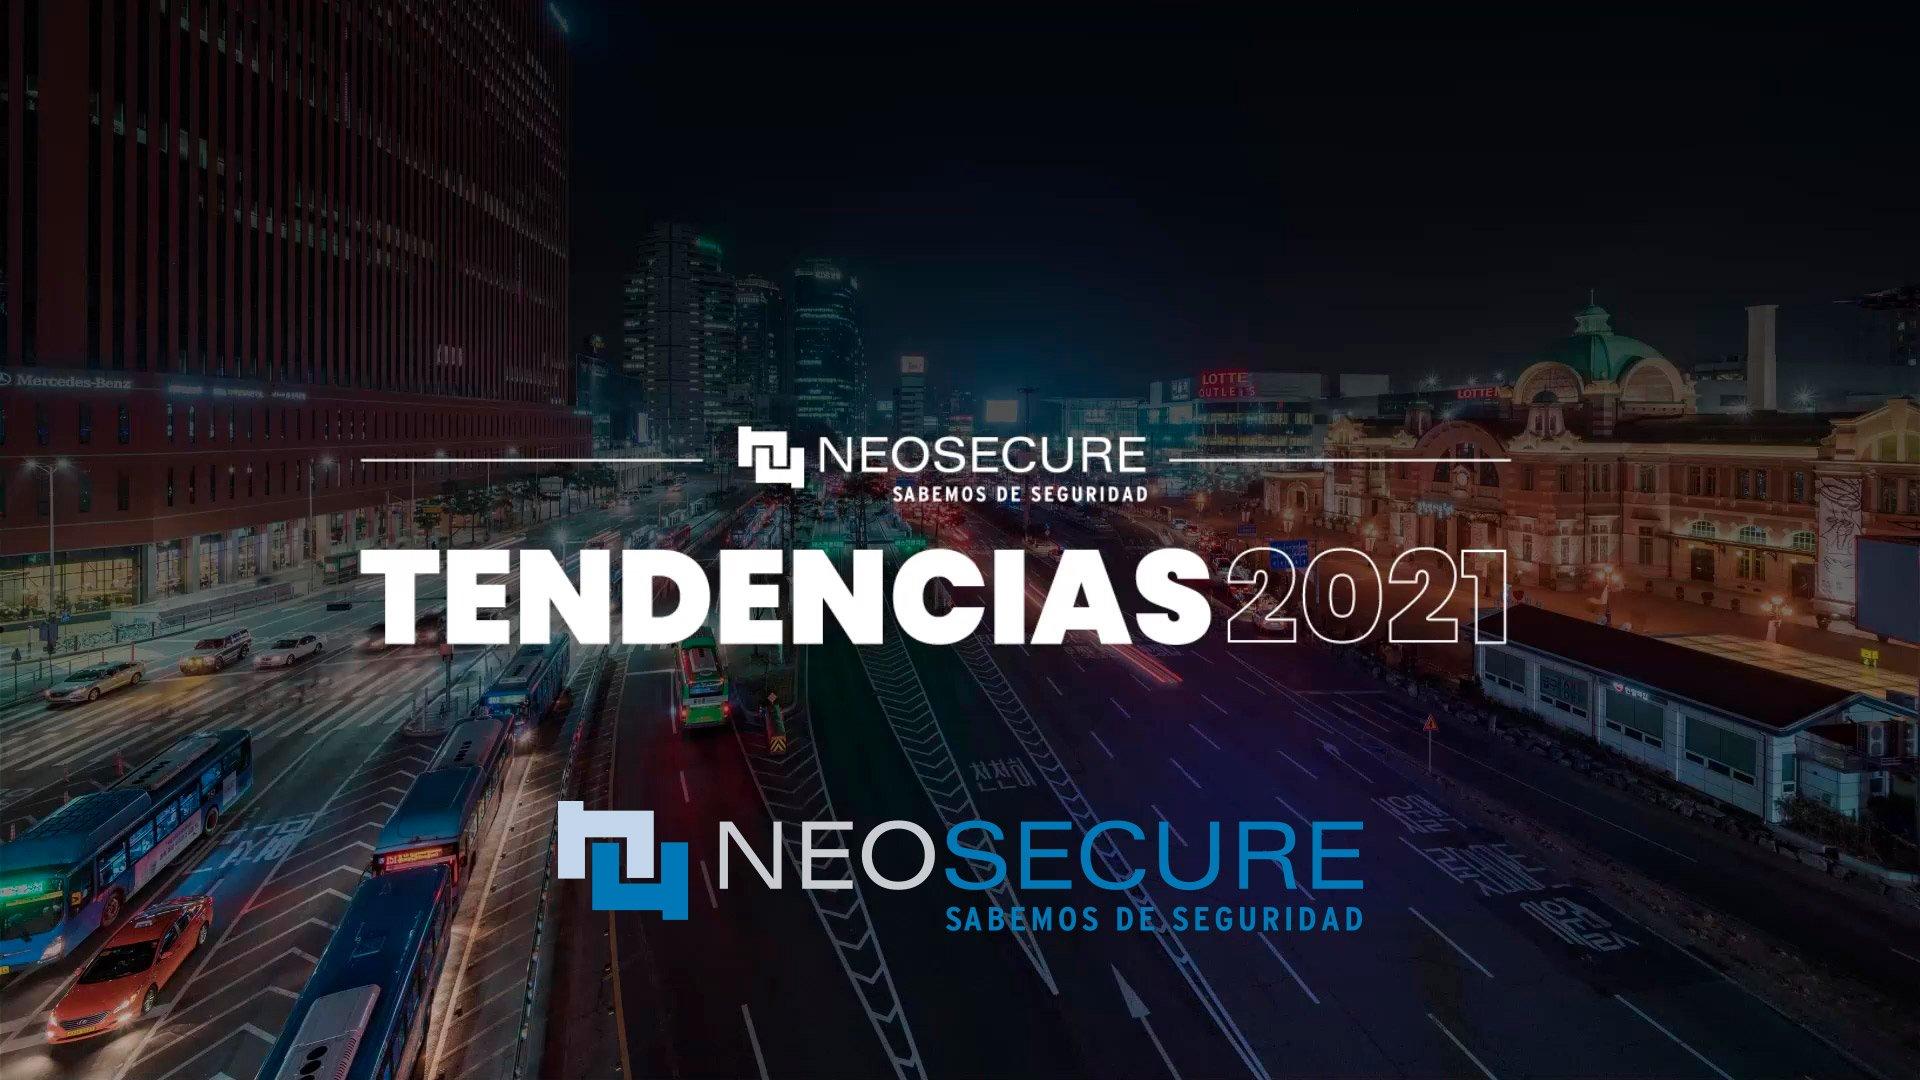 Tendencias-2021-neo